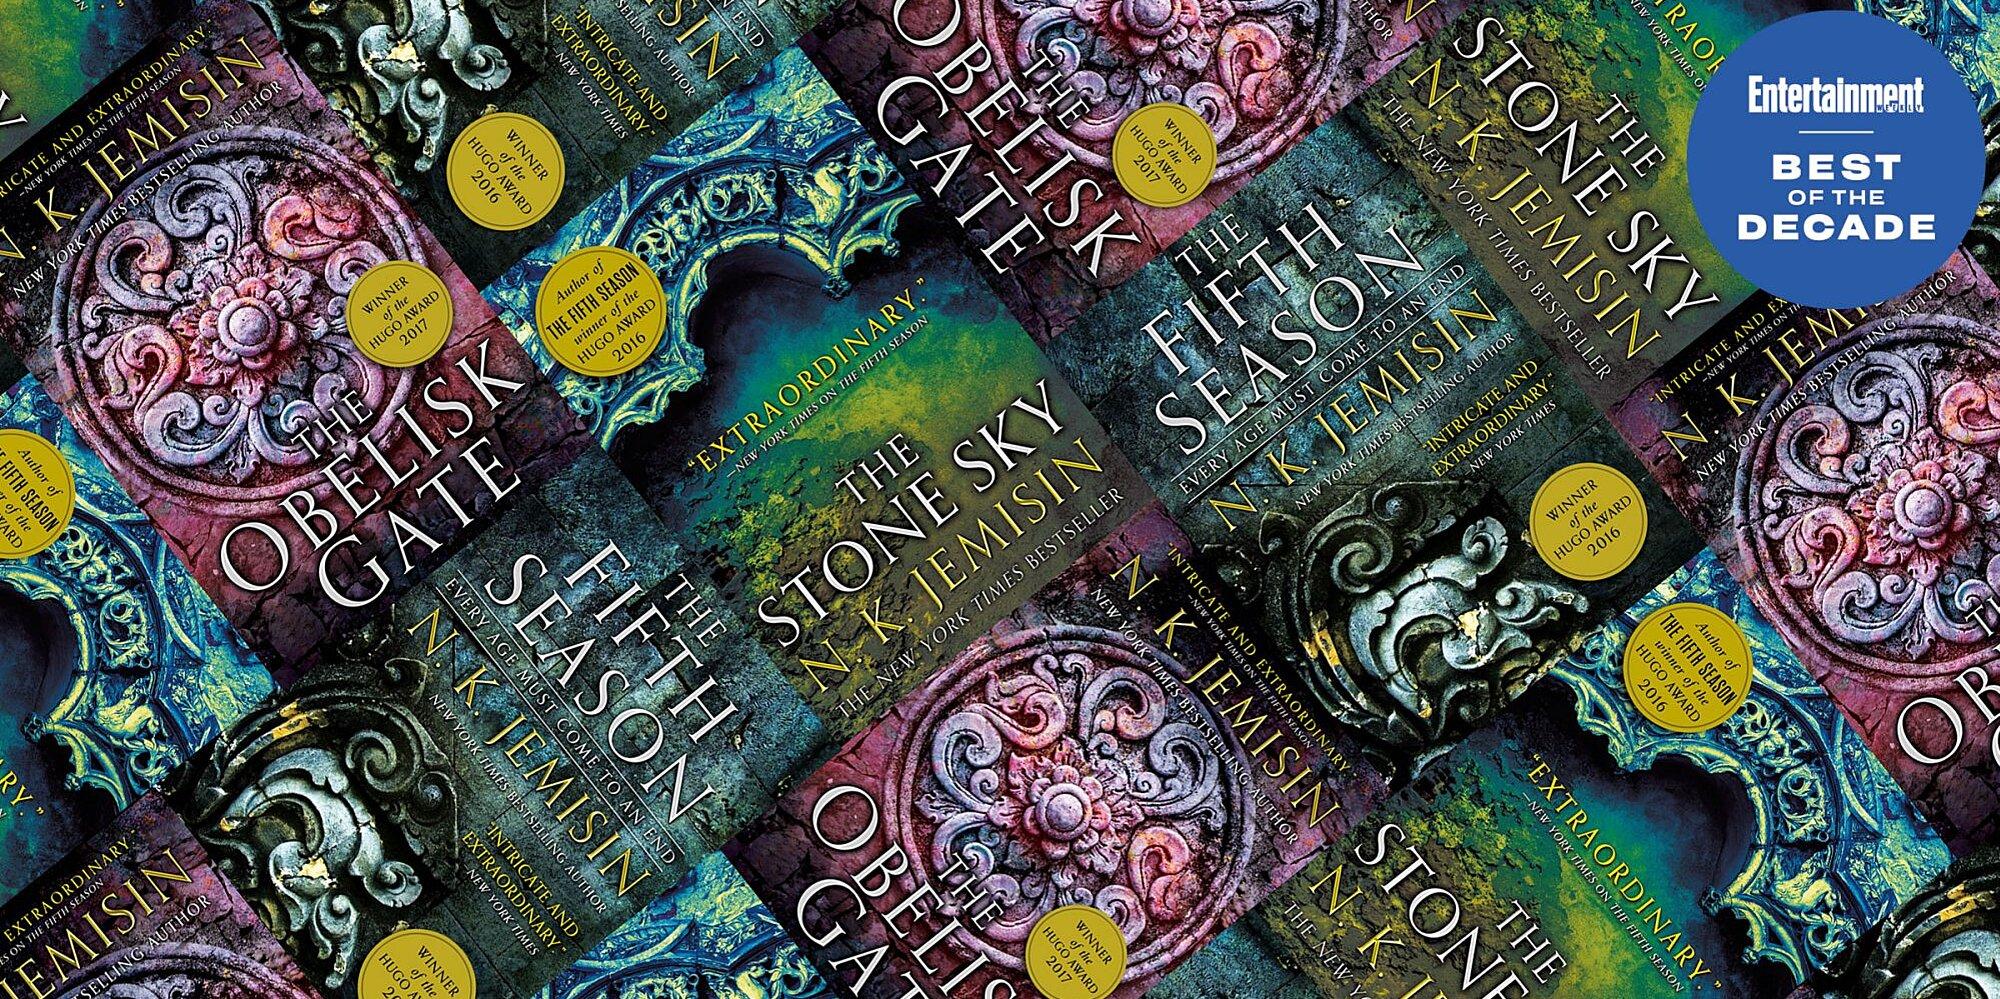 N.K. Jemisin's Broken Earth trilogy is the best fantasy of the decade